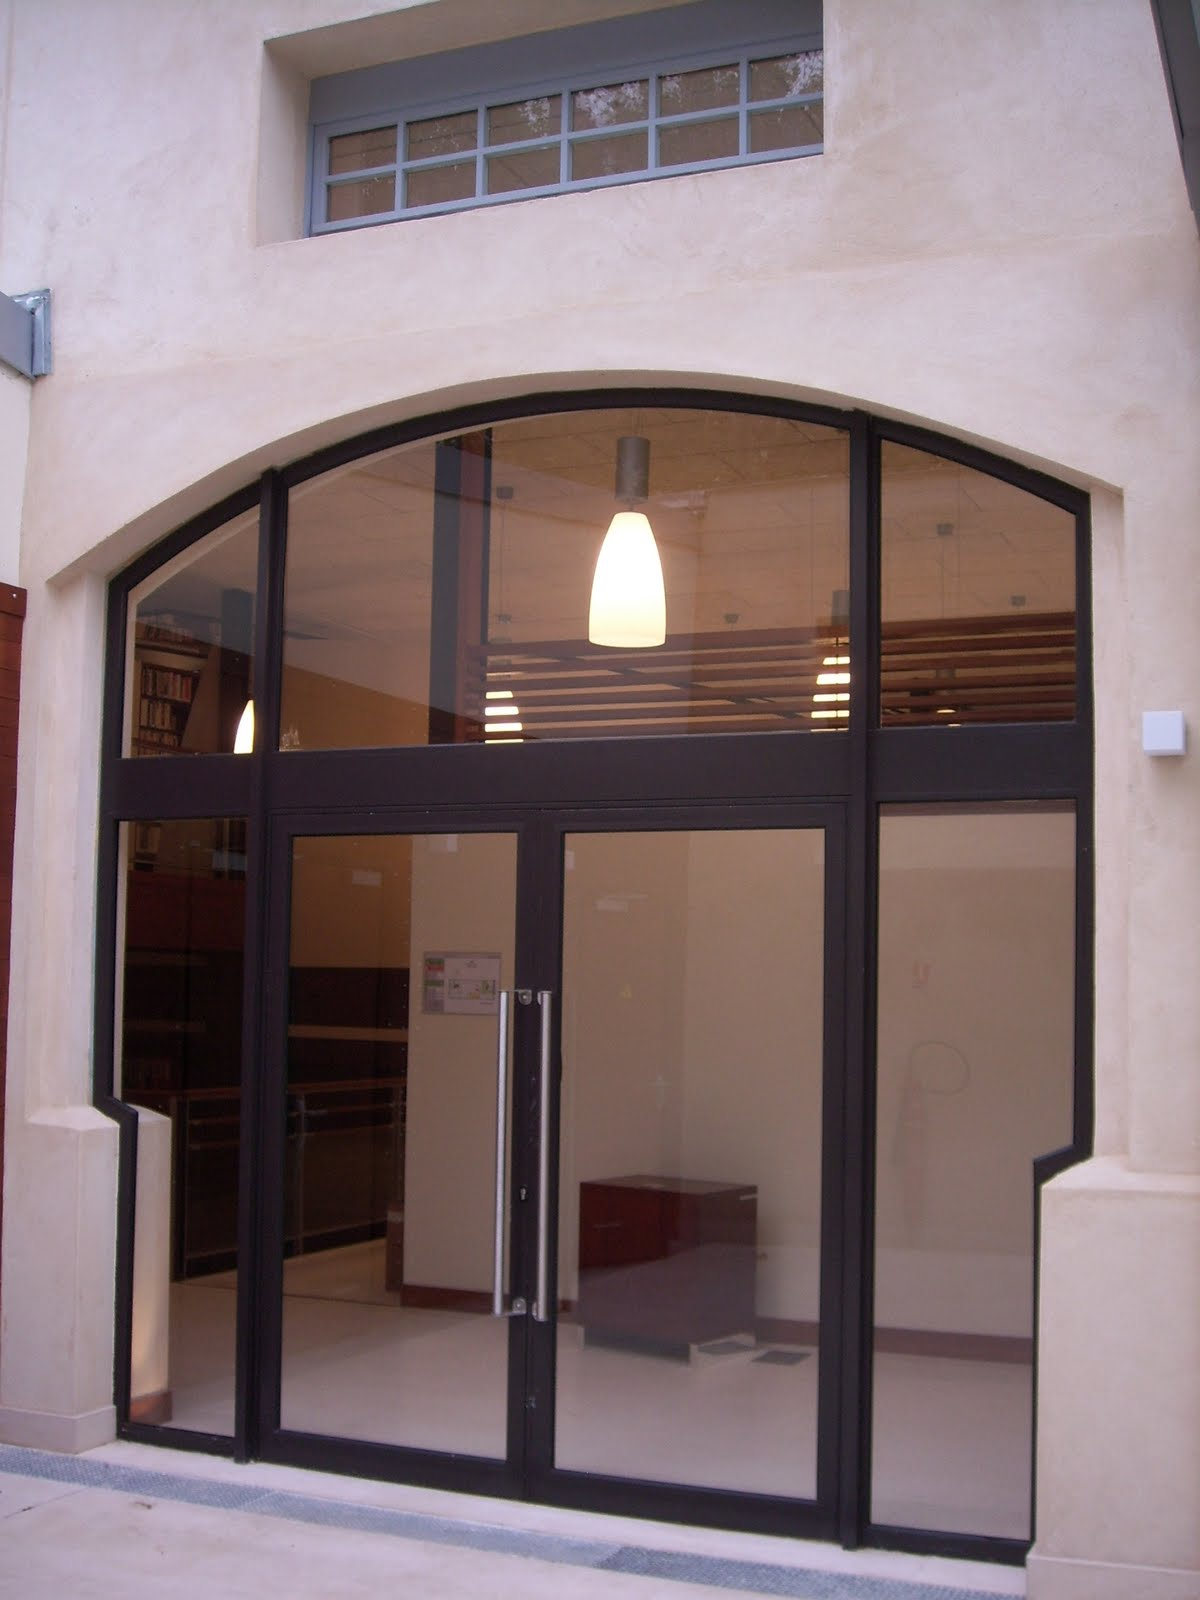 Verrière acier et portes aluminium